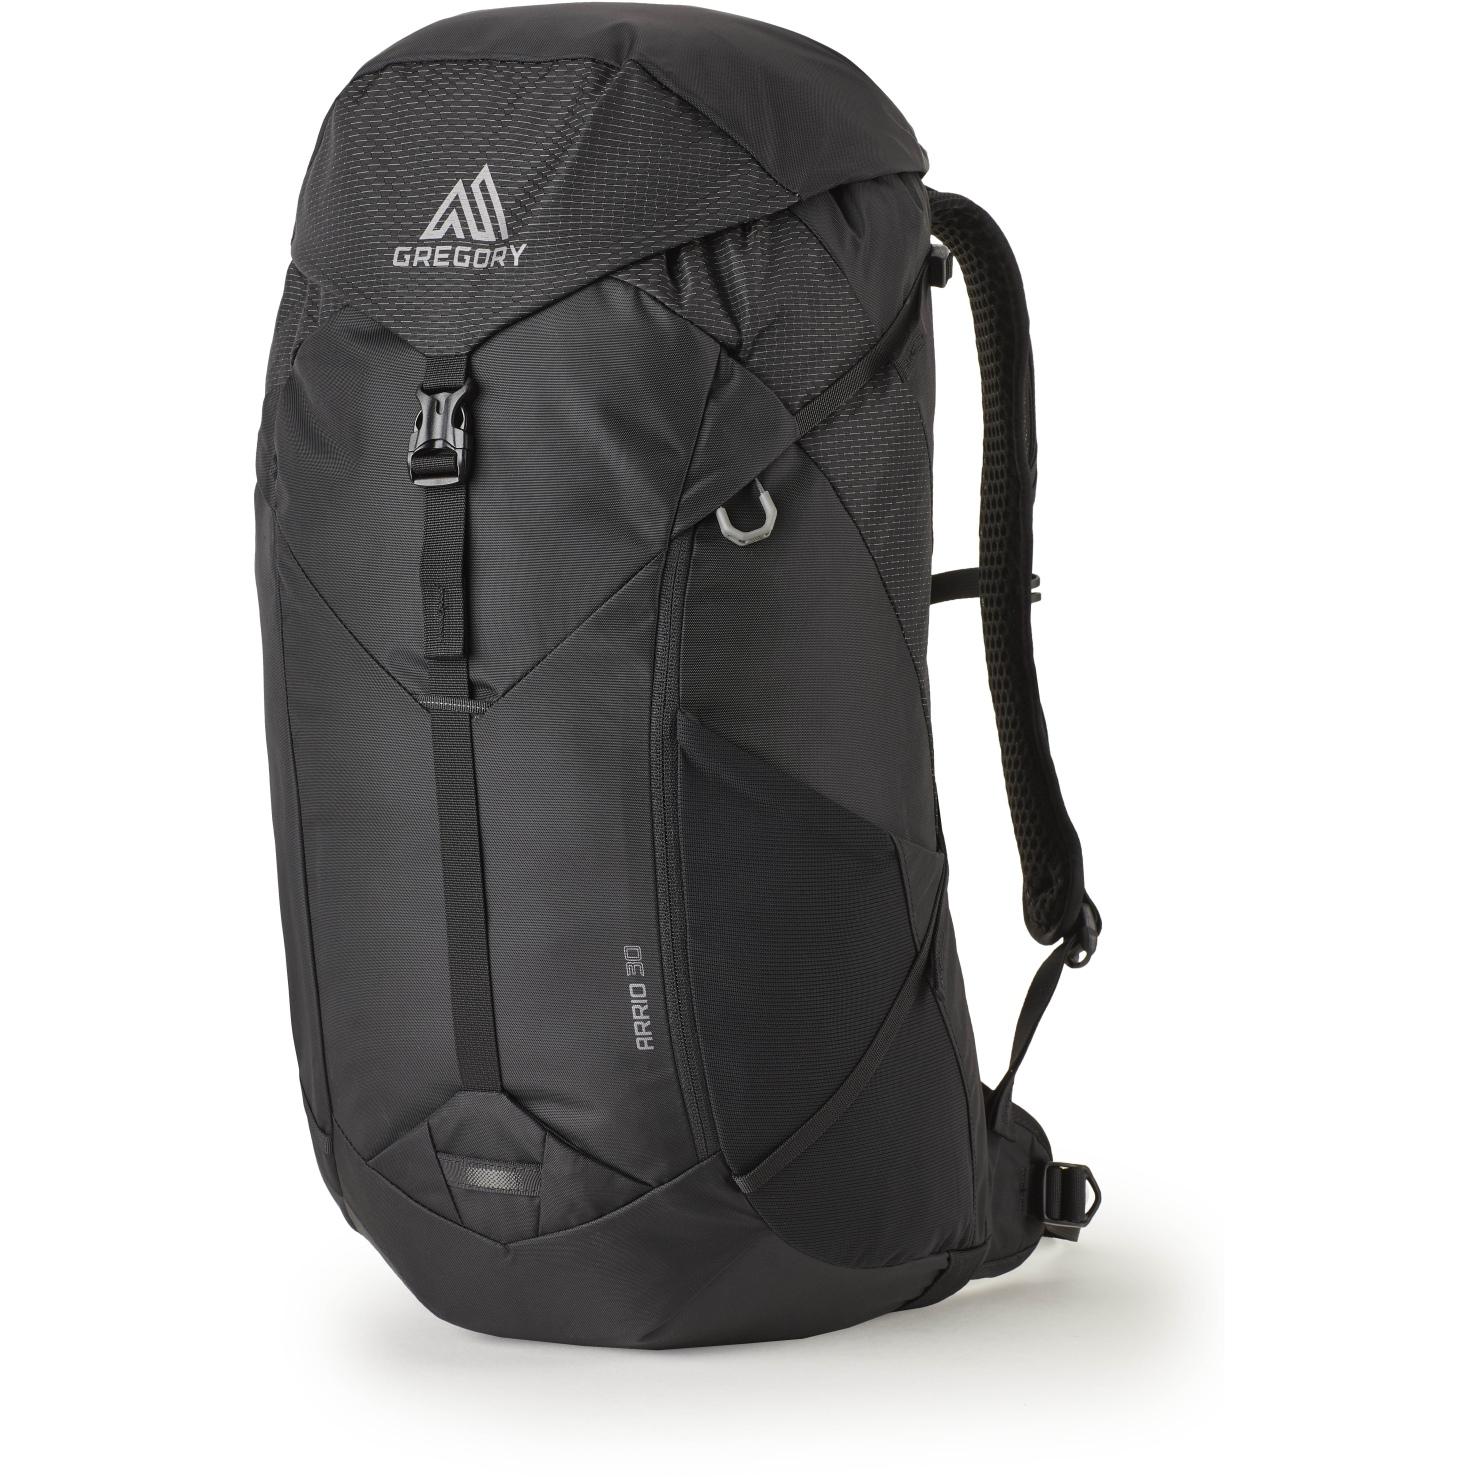 Gregory Arrio 30 Backpack - Flame Black